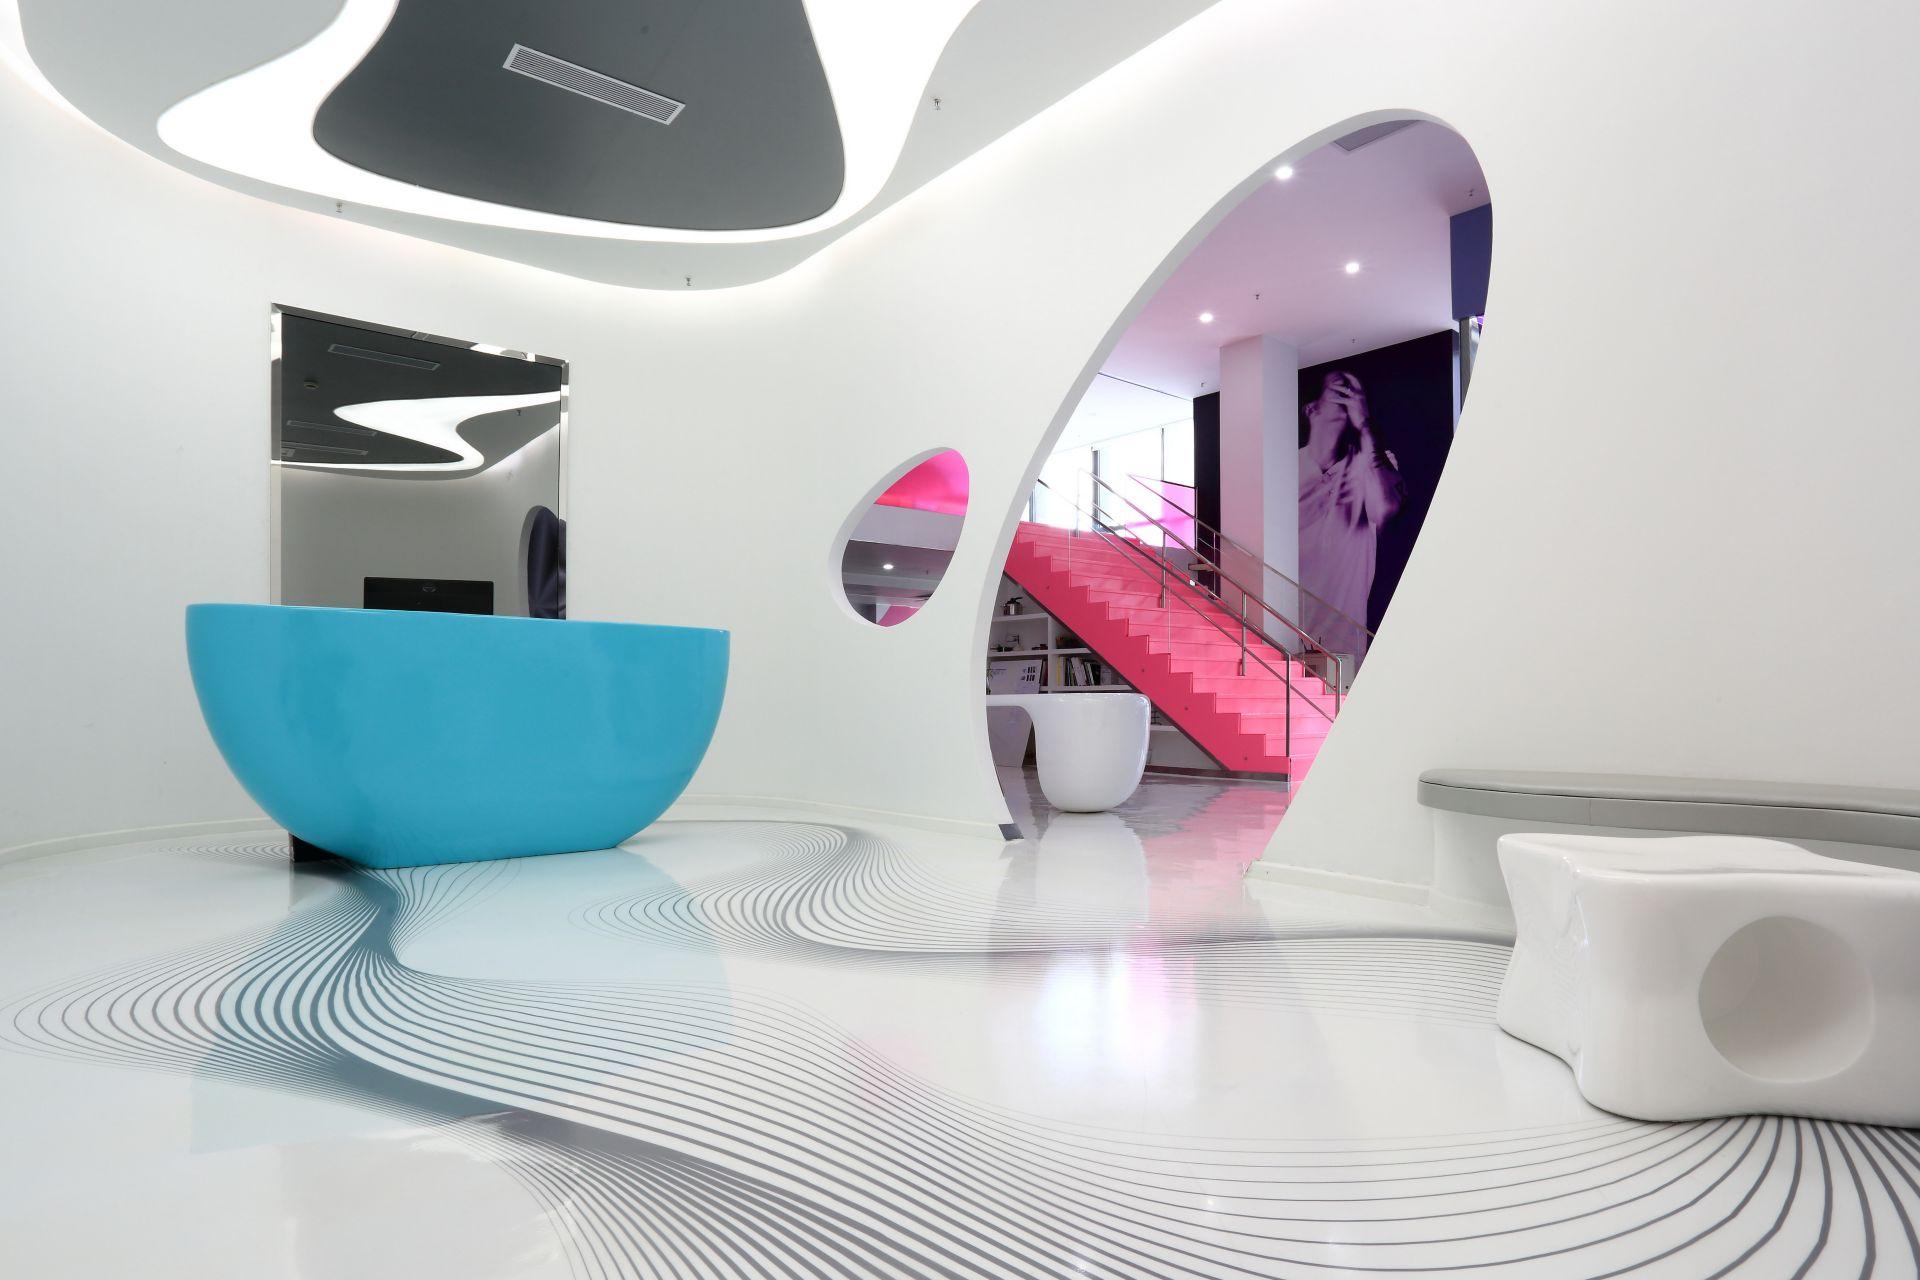 Decorative white floor made with Sika ComfortFloor system at Karim Rashid Design Institute in Shenzhen, China